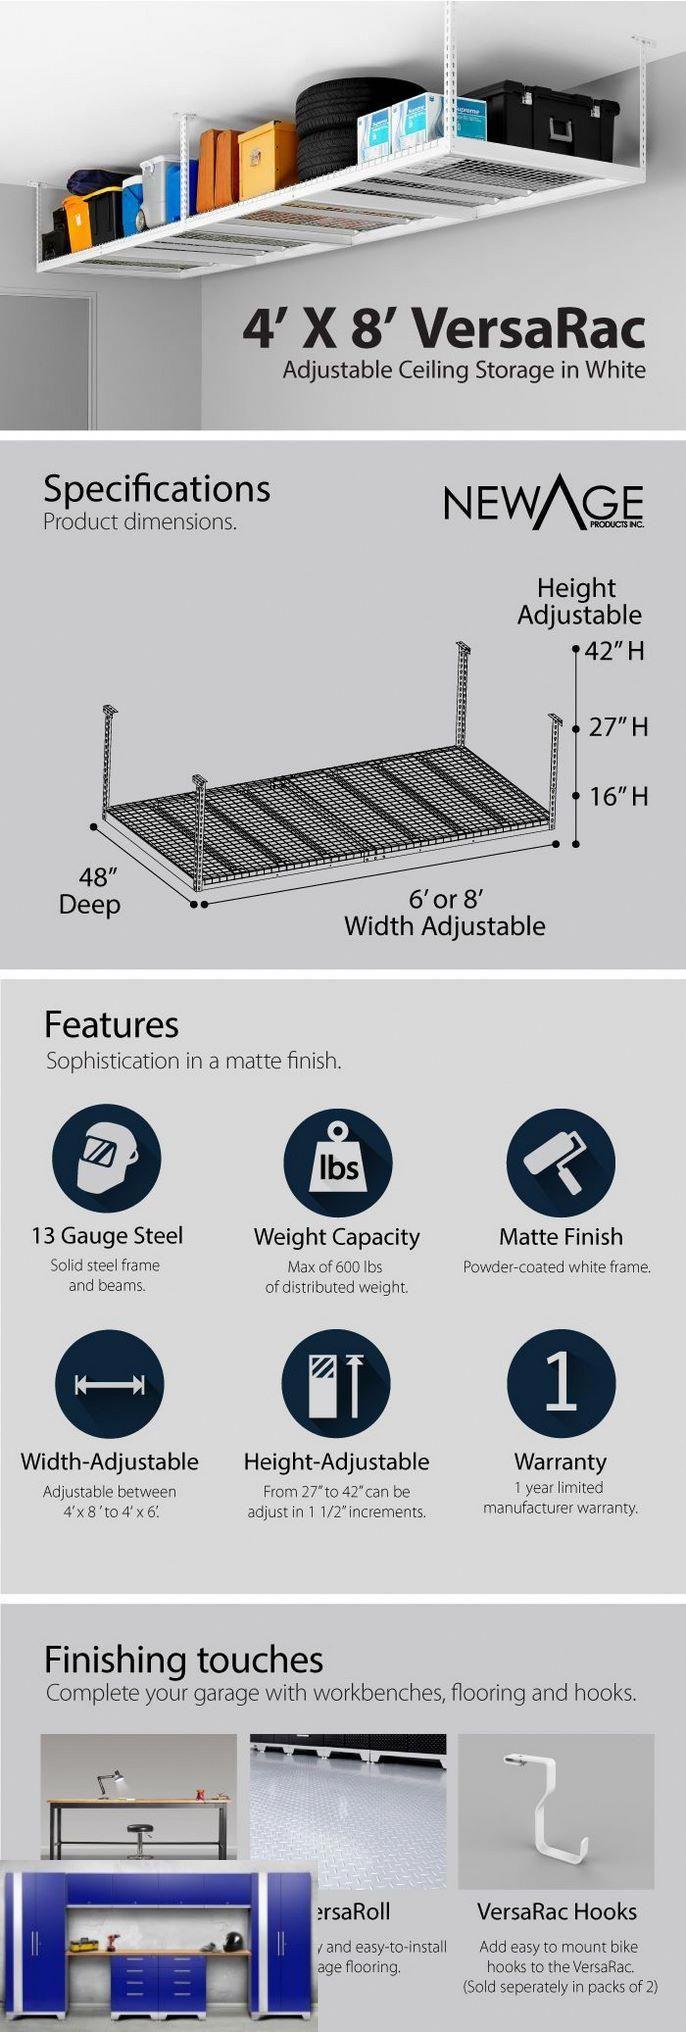 Heavy Duty Garage Shelving Costco And Garage Ceiling Storage Rack Plans Garageshelving Opslag Meubel Ideeen Opberging